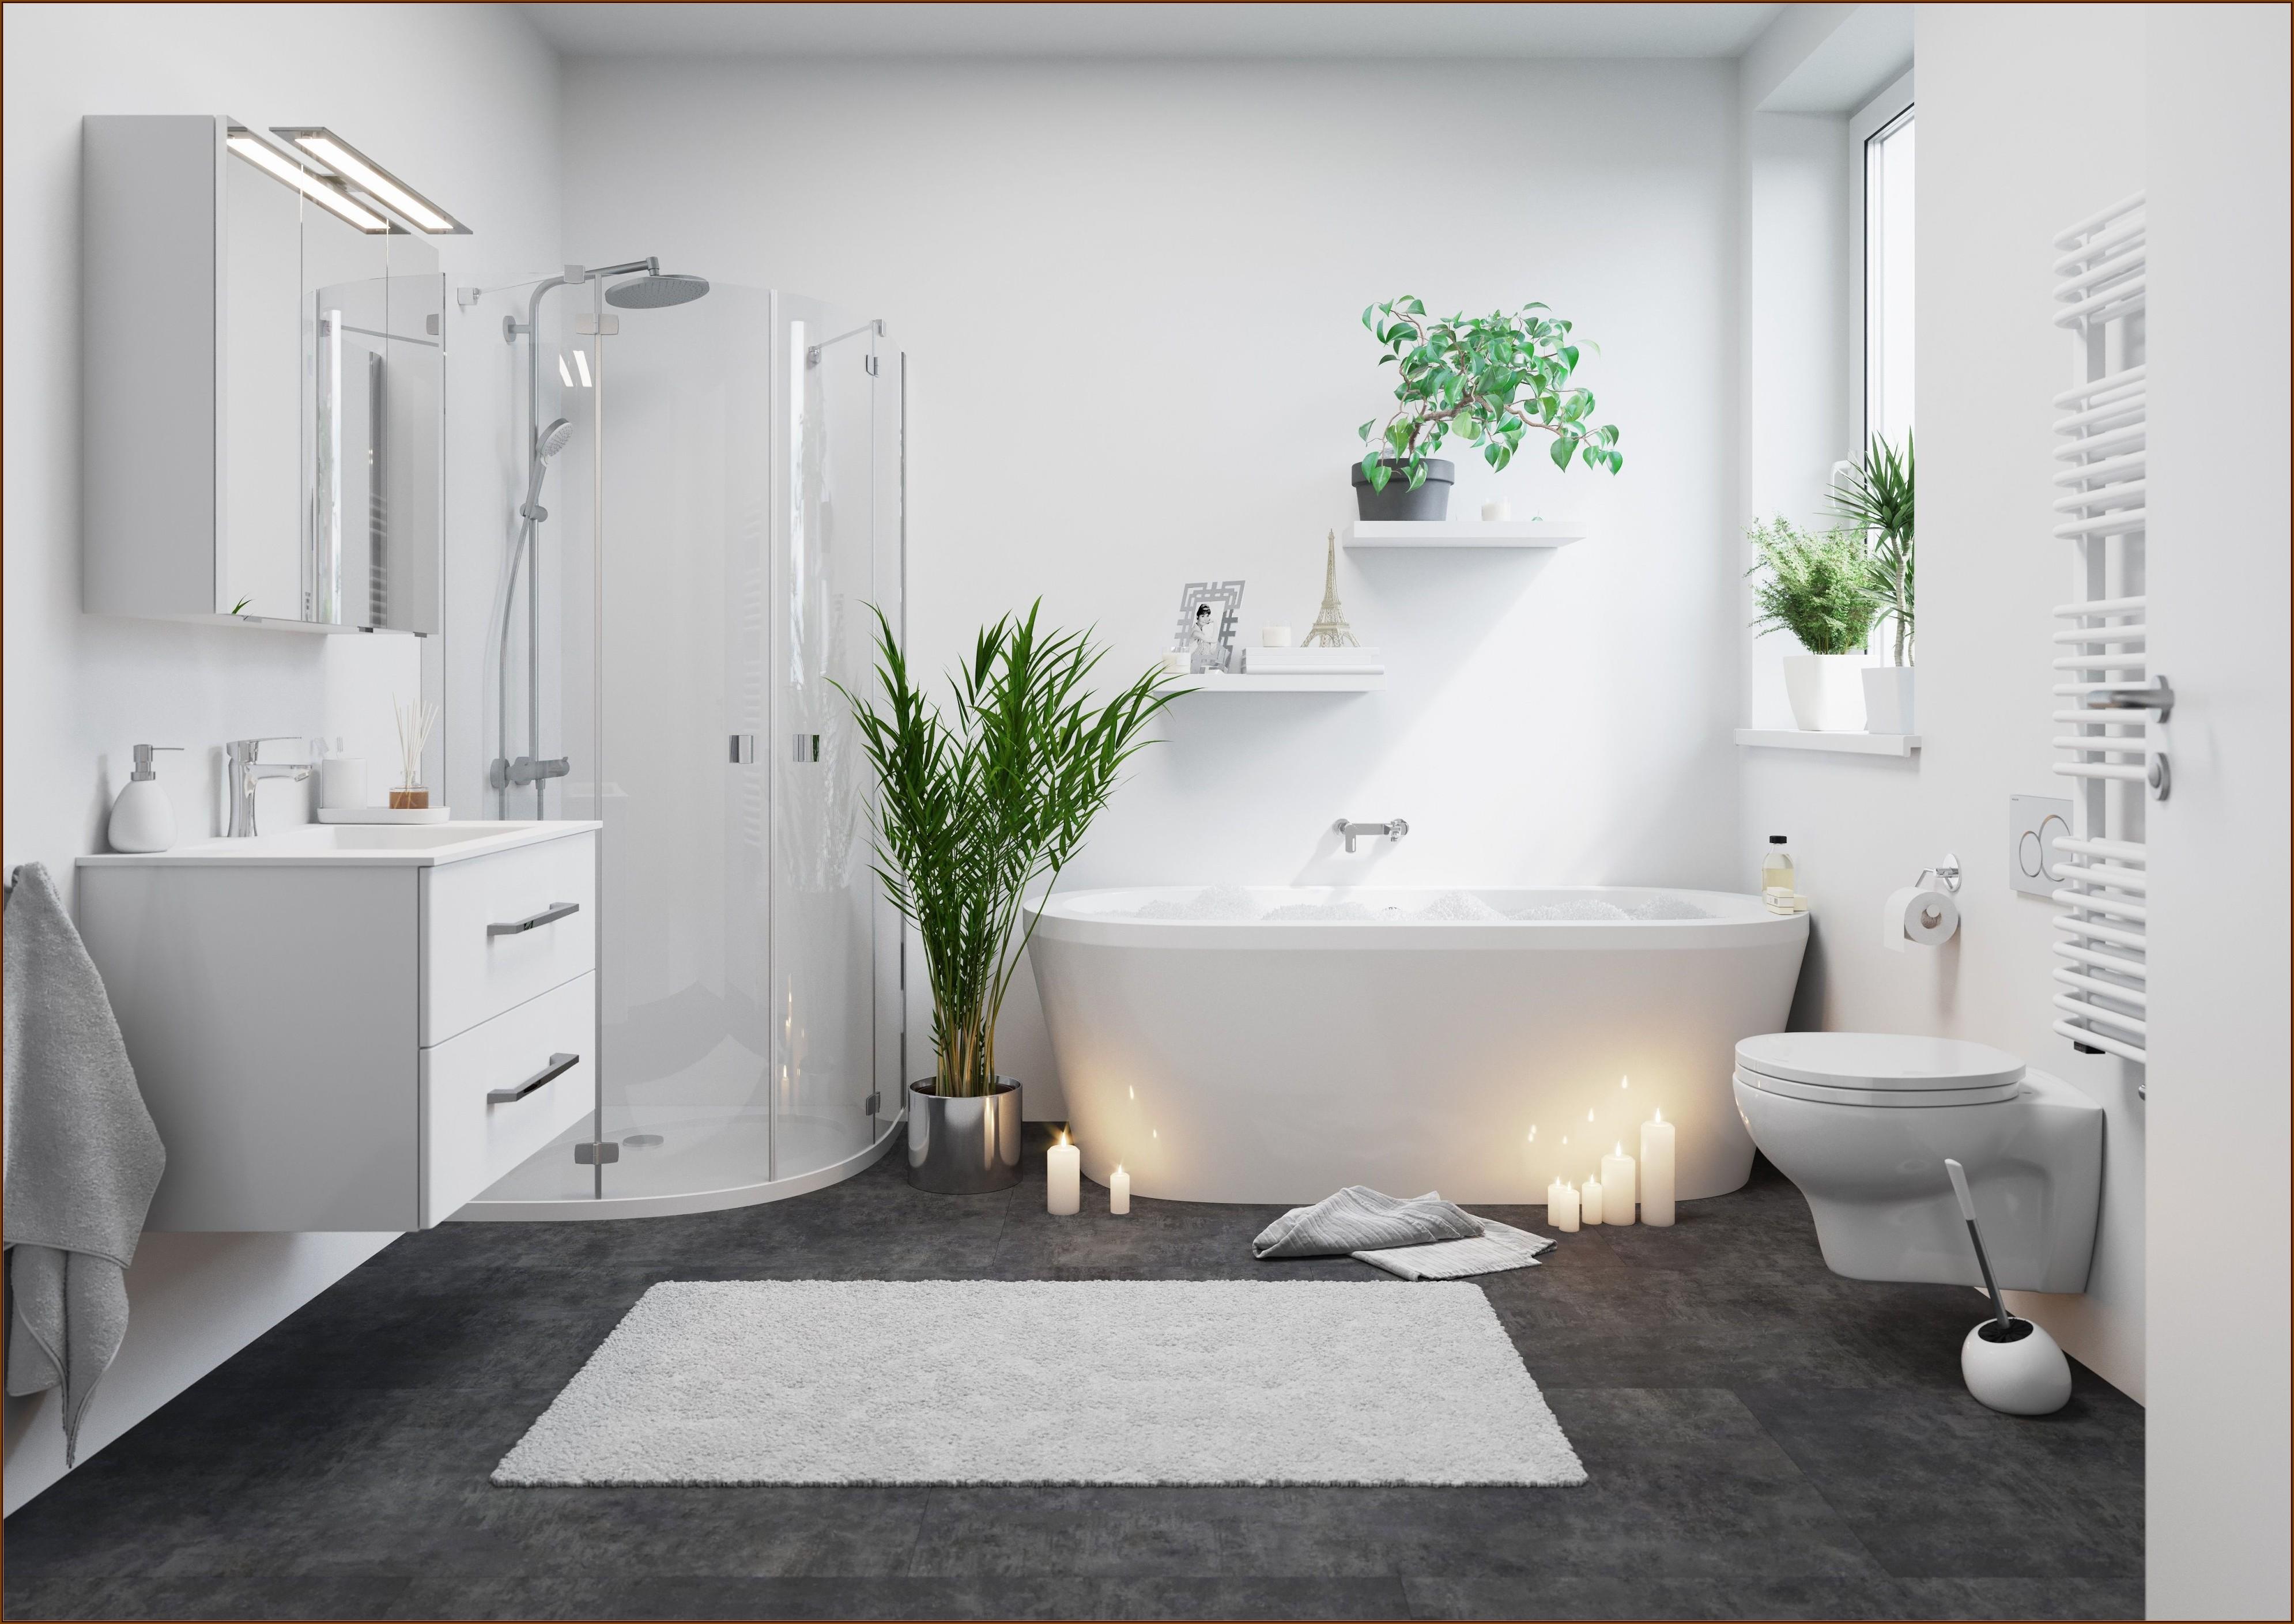 Badezimmer Deko Bilder